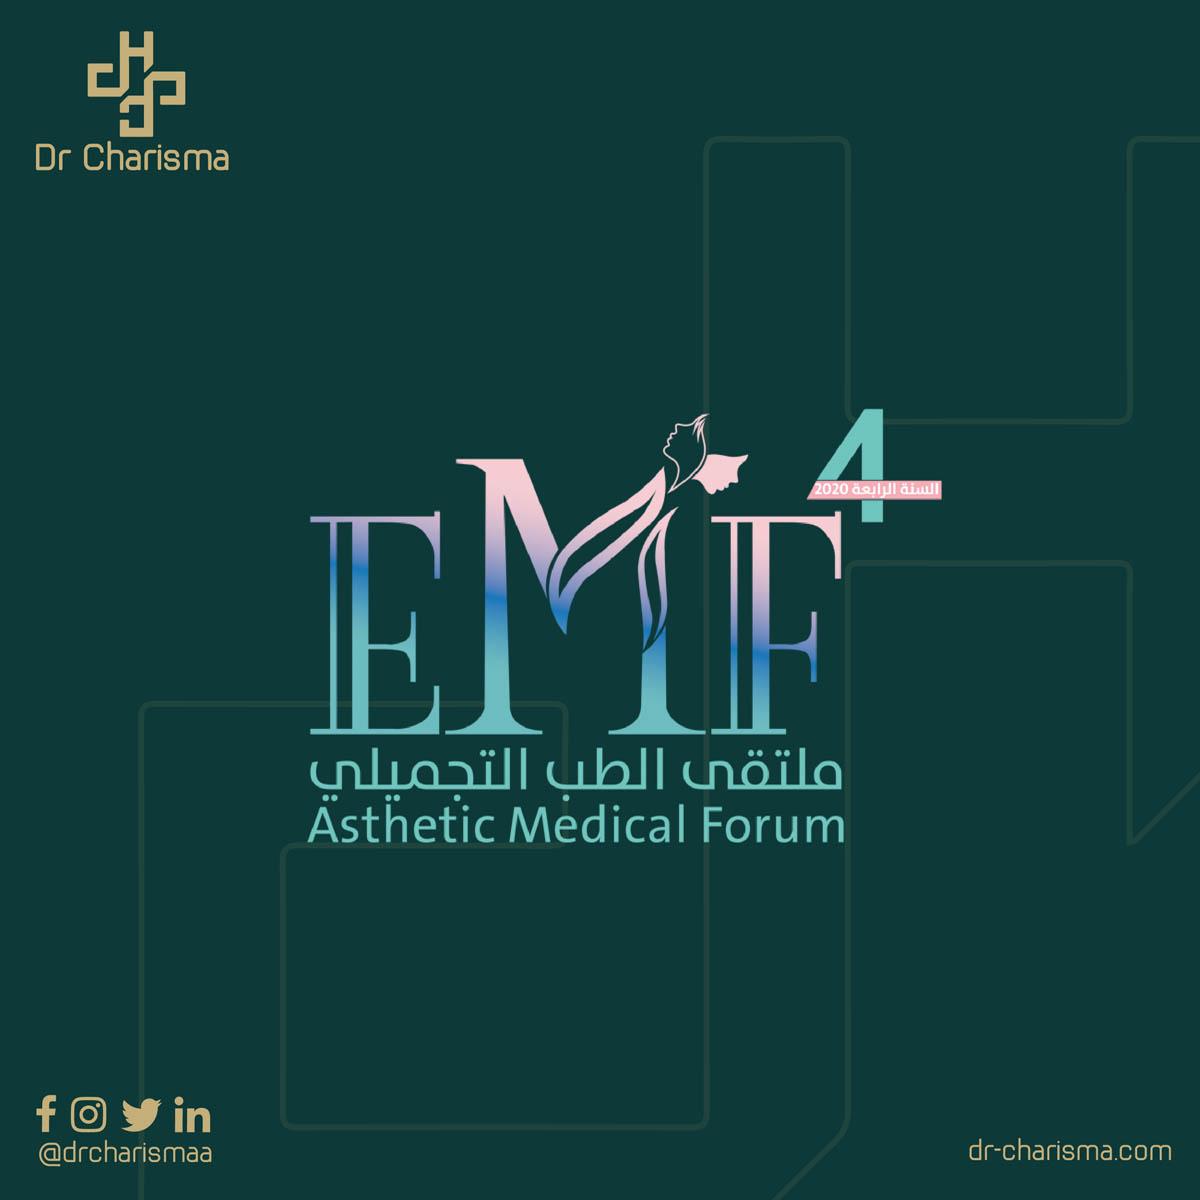 Aesthetic Medical Forum